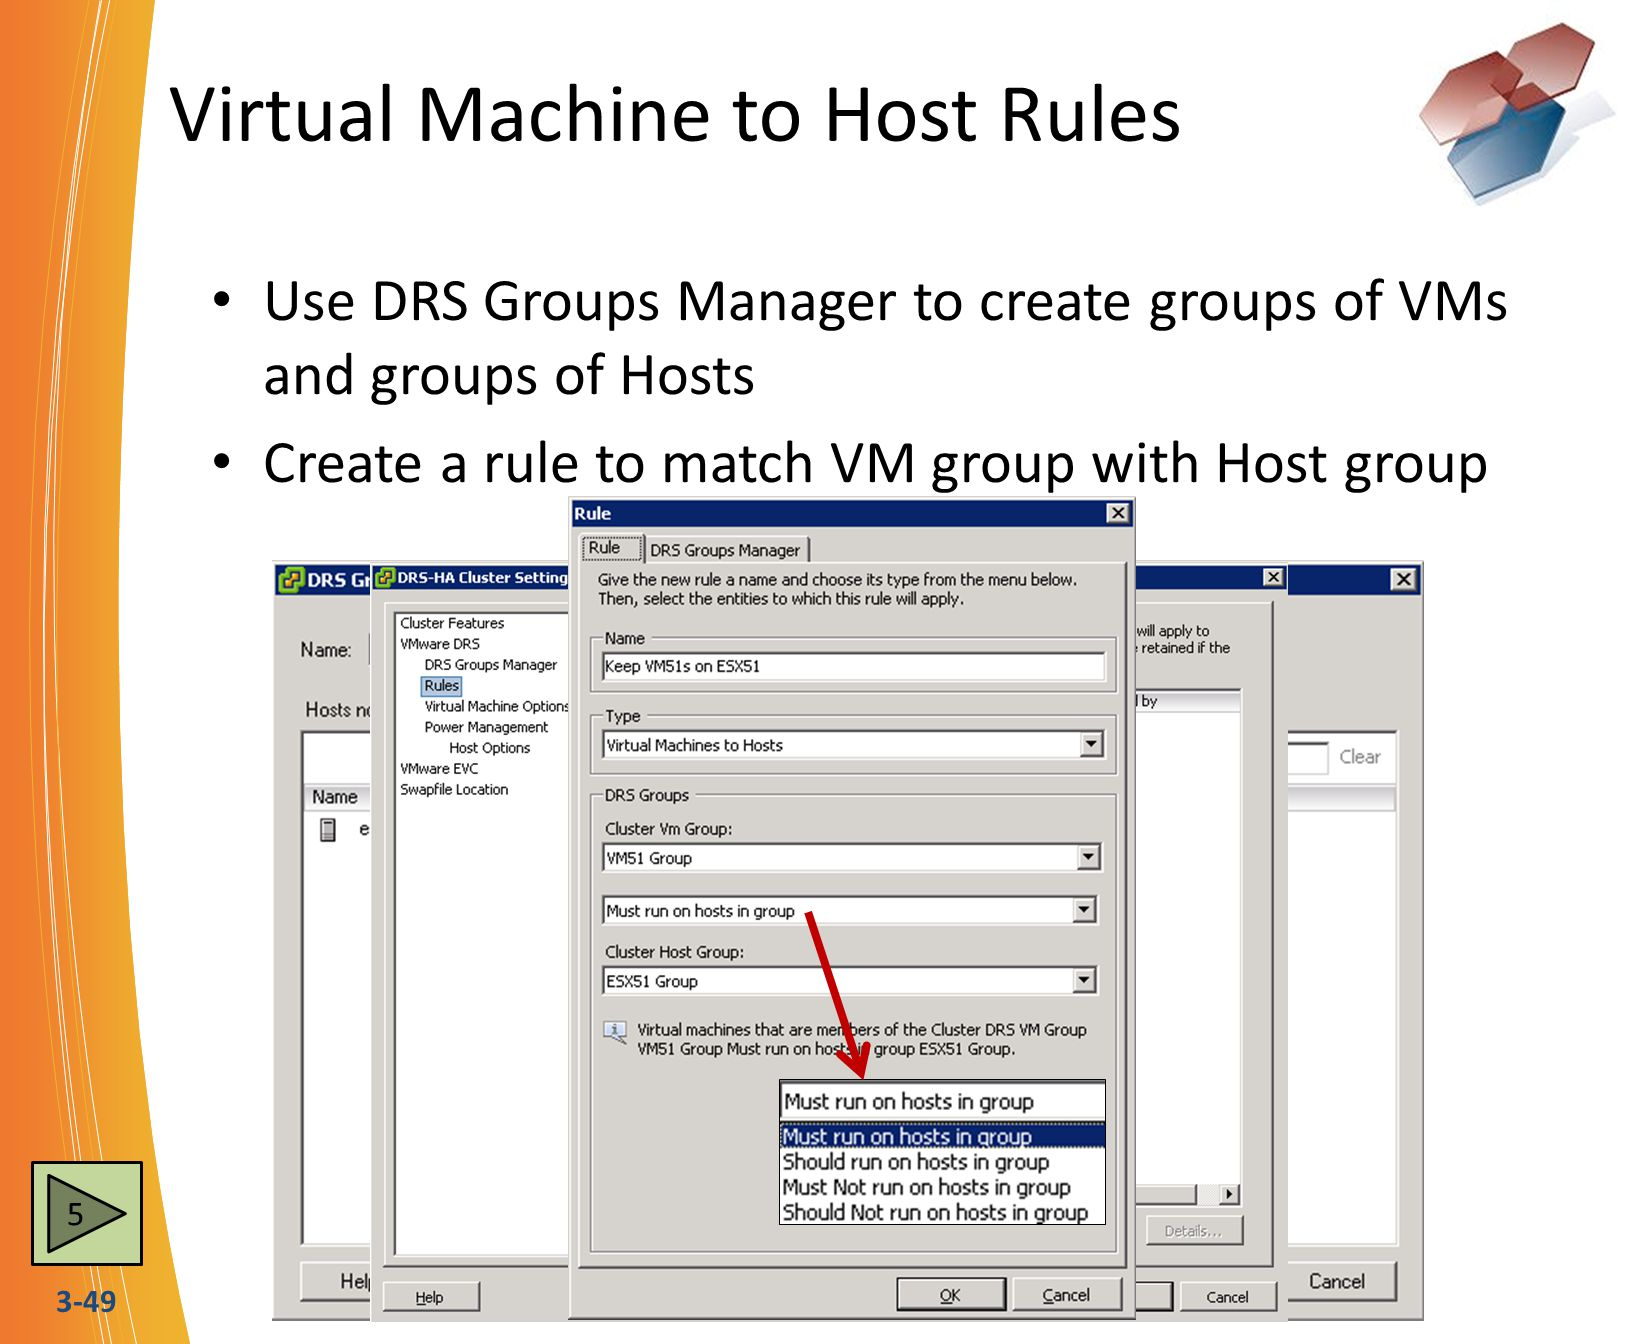 Virtual Machine to Host Rules